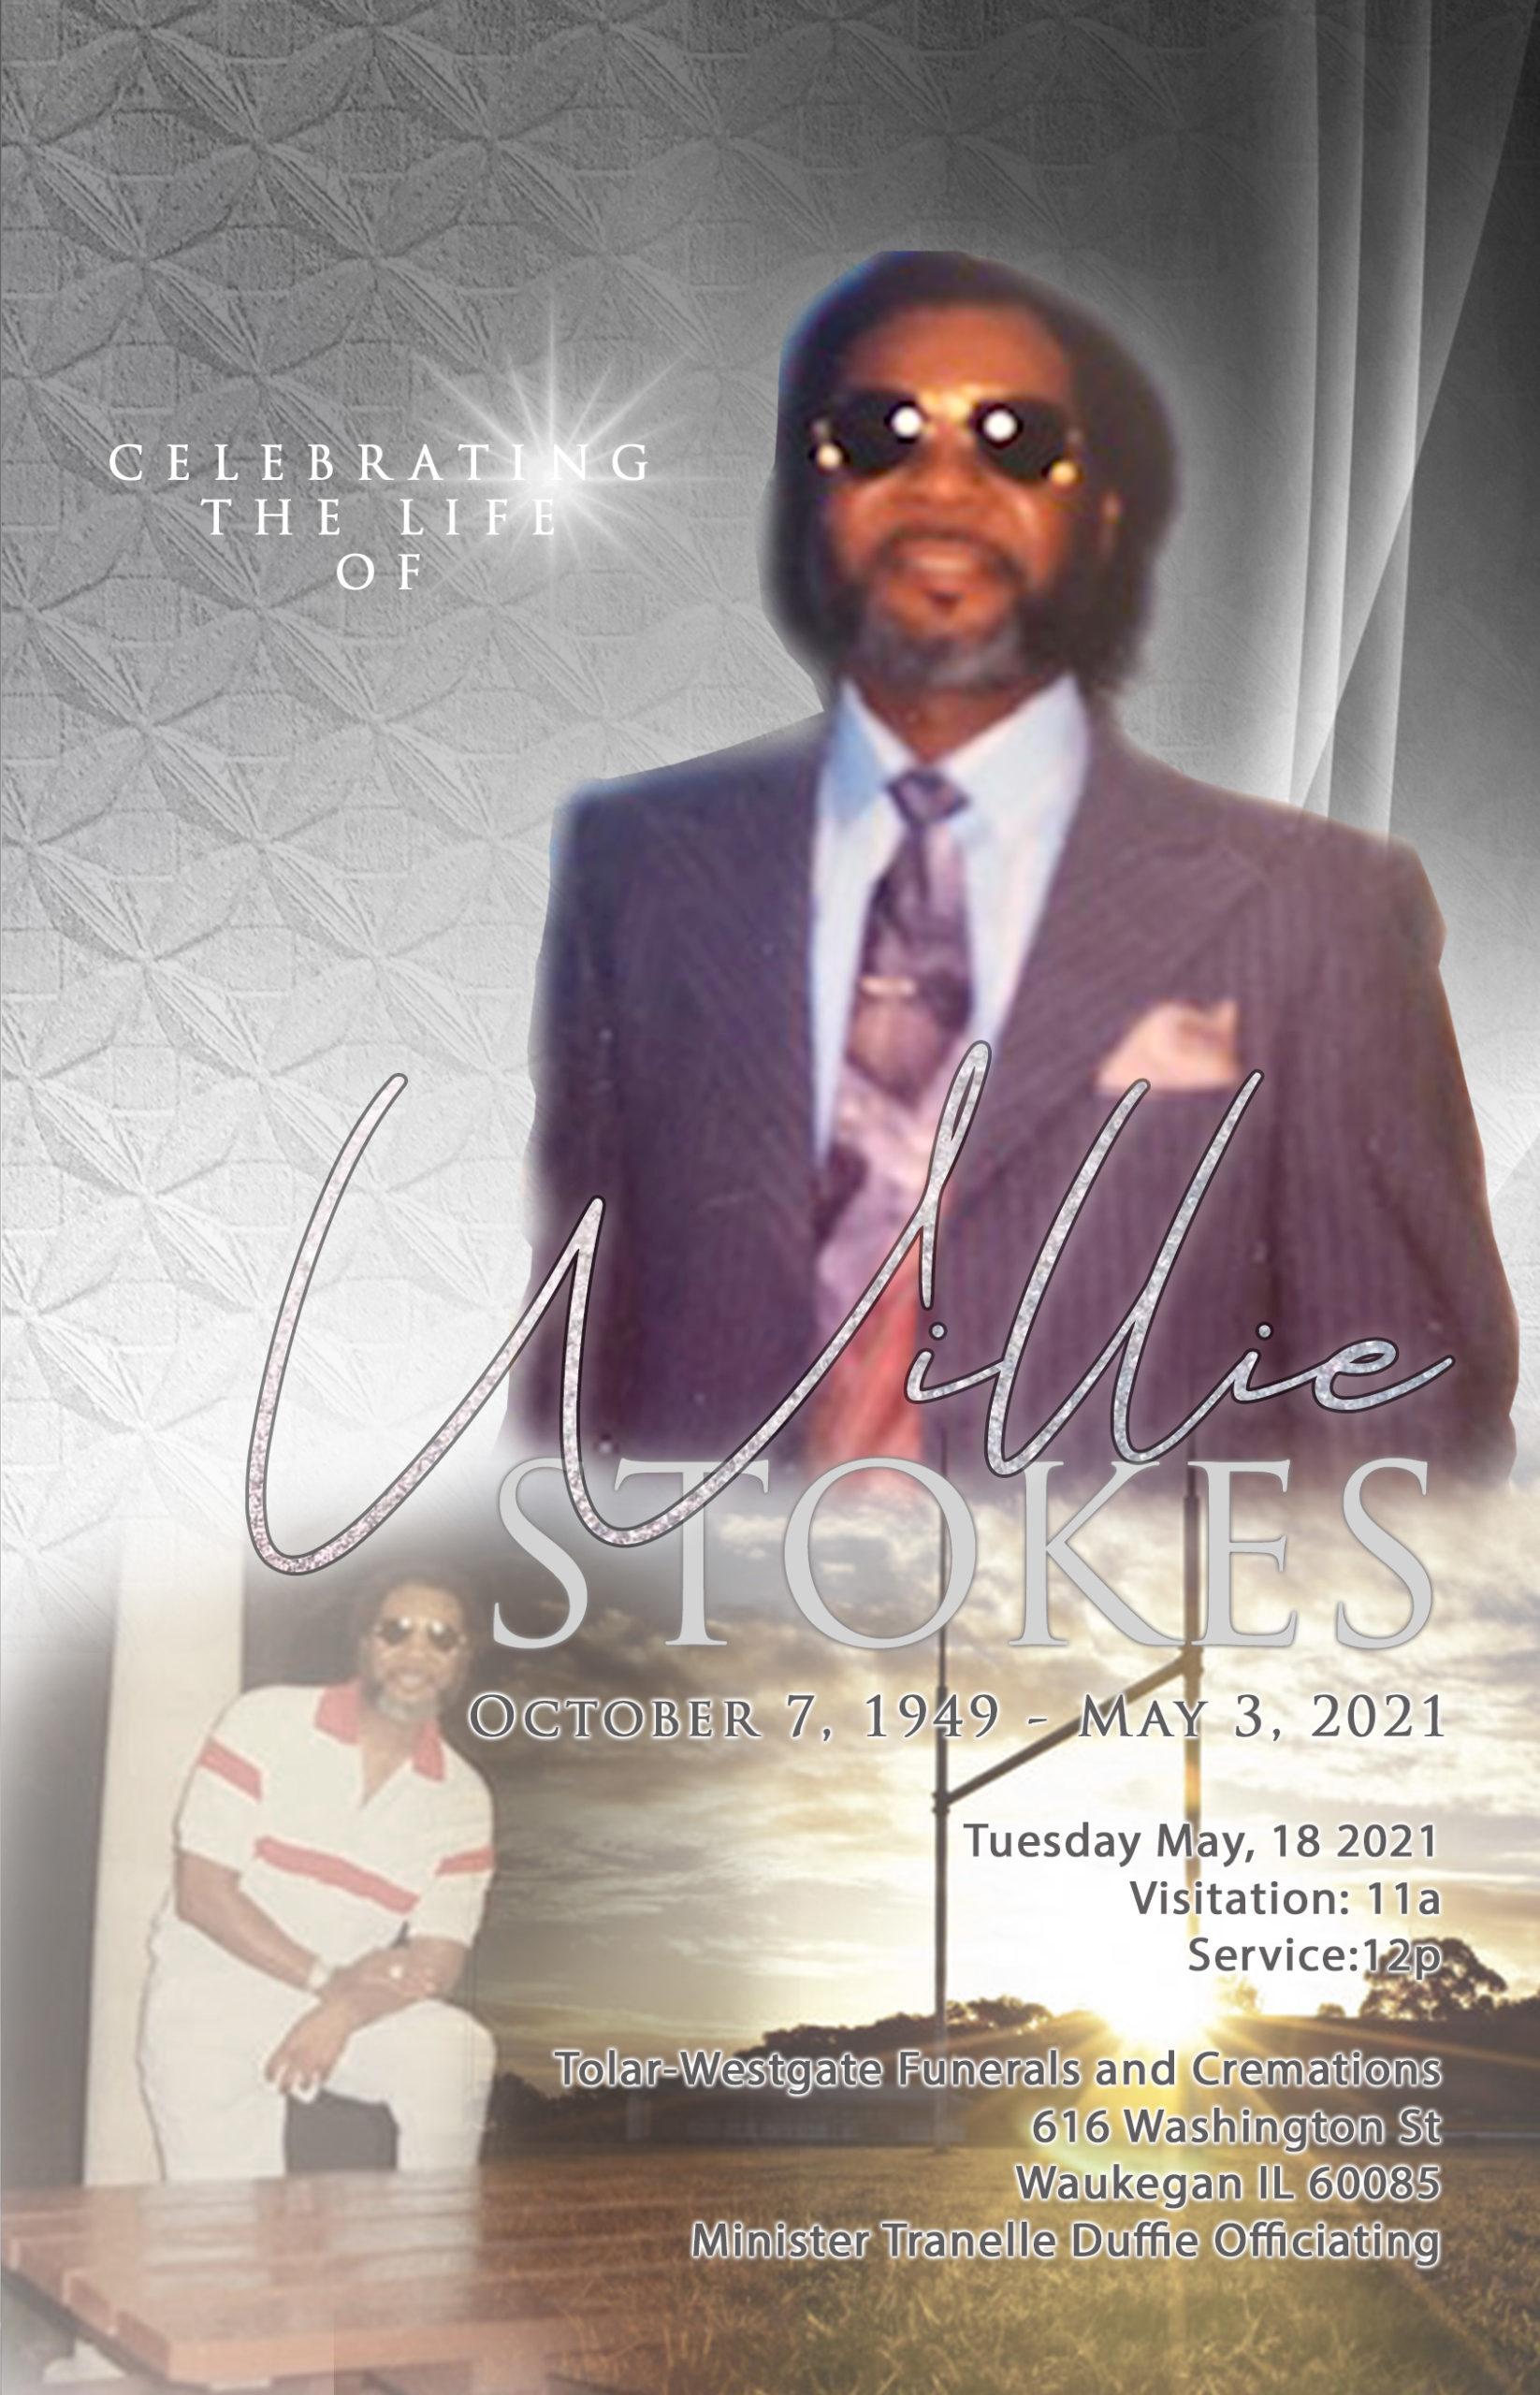 Willie Stokes 1949-2021